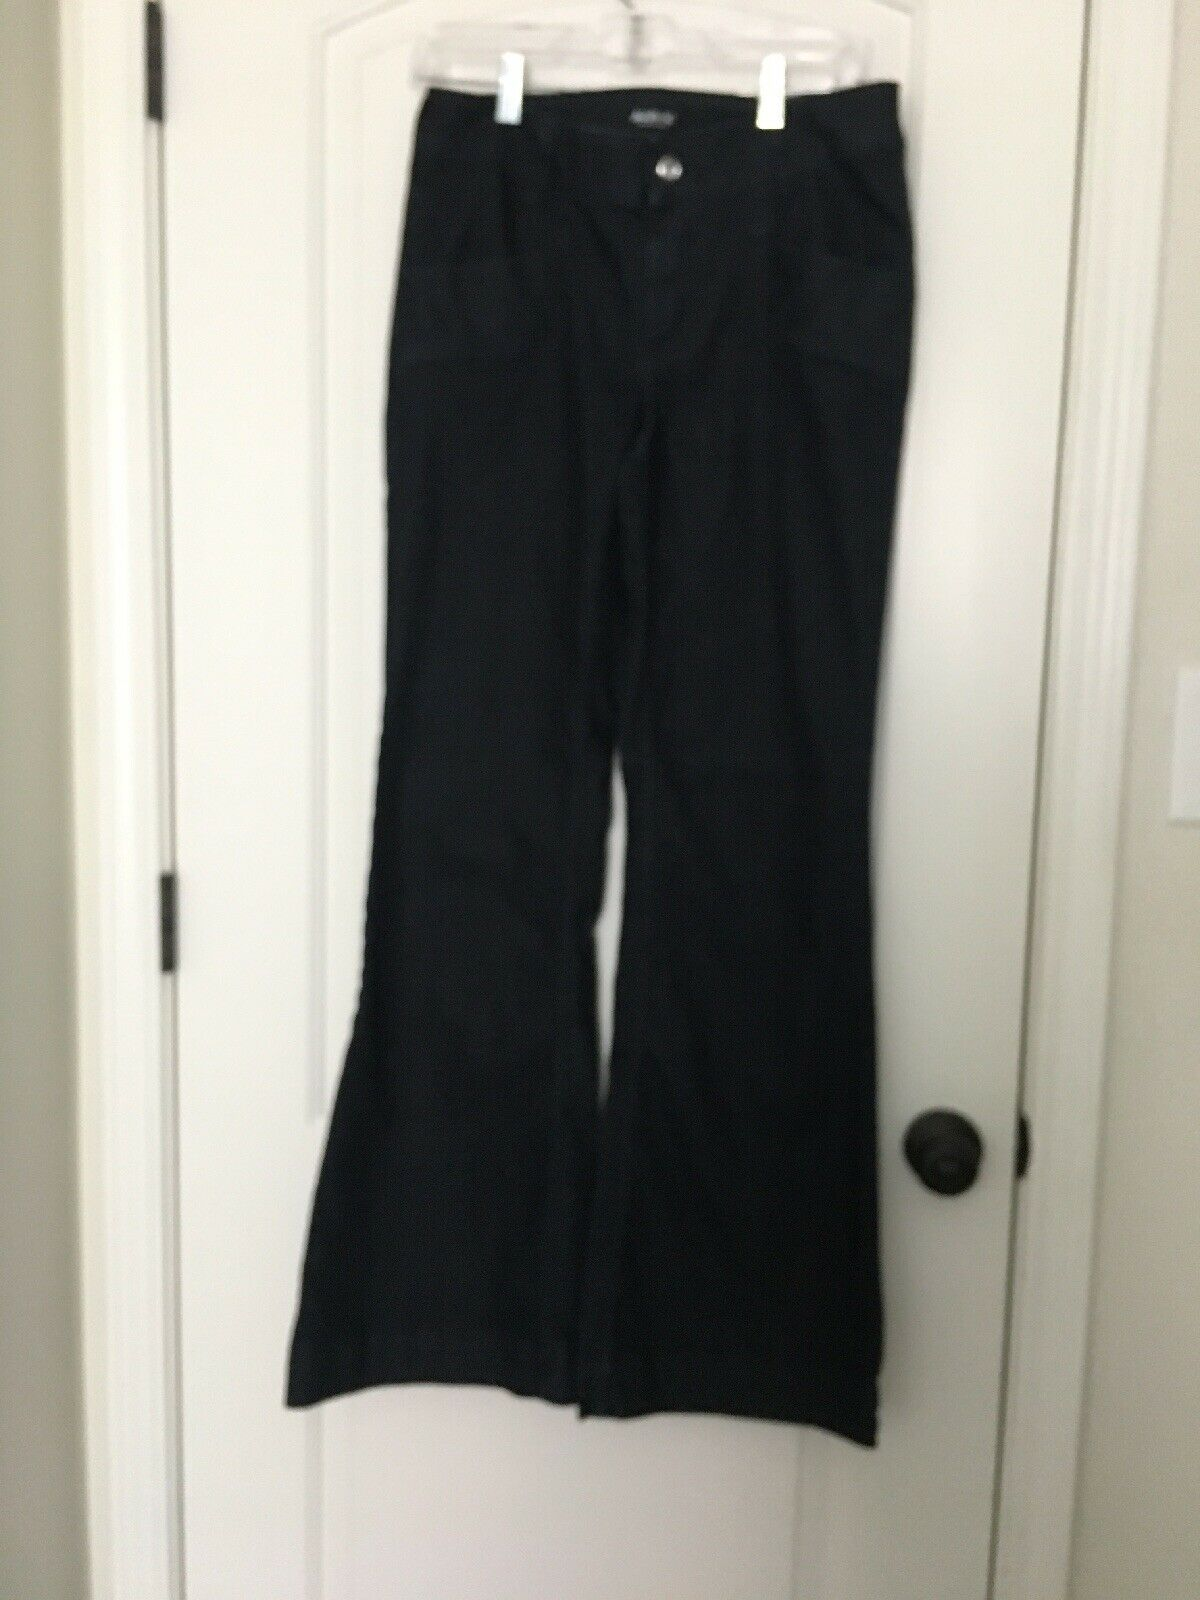 Allen B By Allen Schwartz Femme Blau Denim jeans pantalons SZ 8 Vêtements